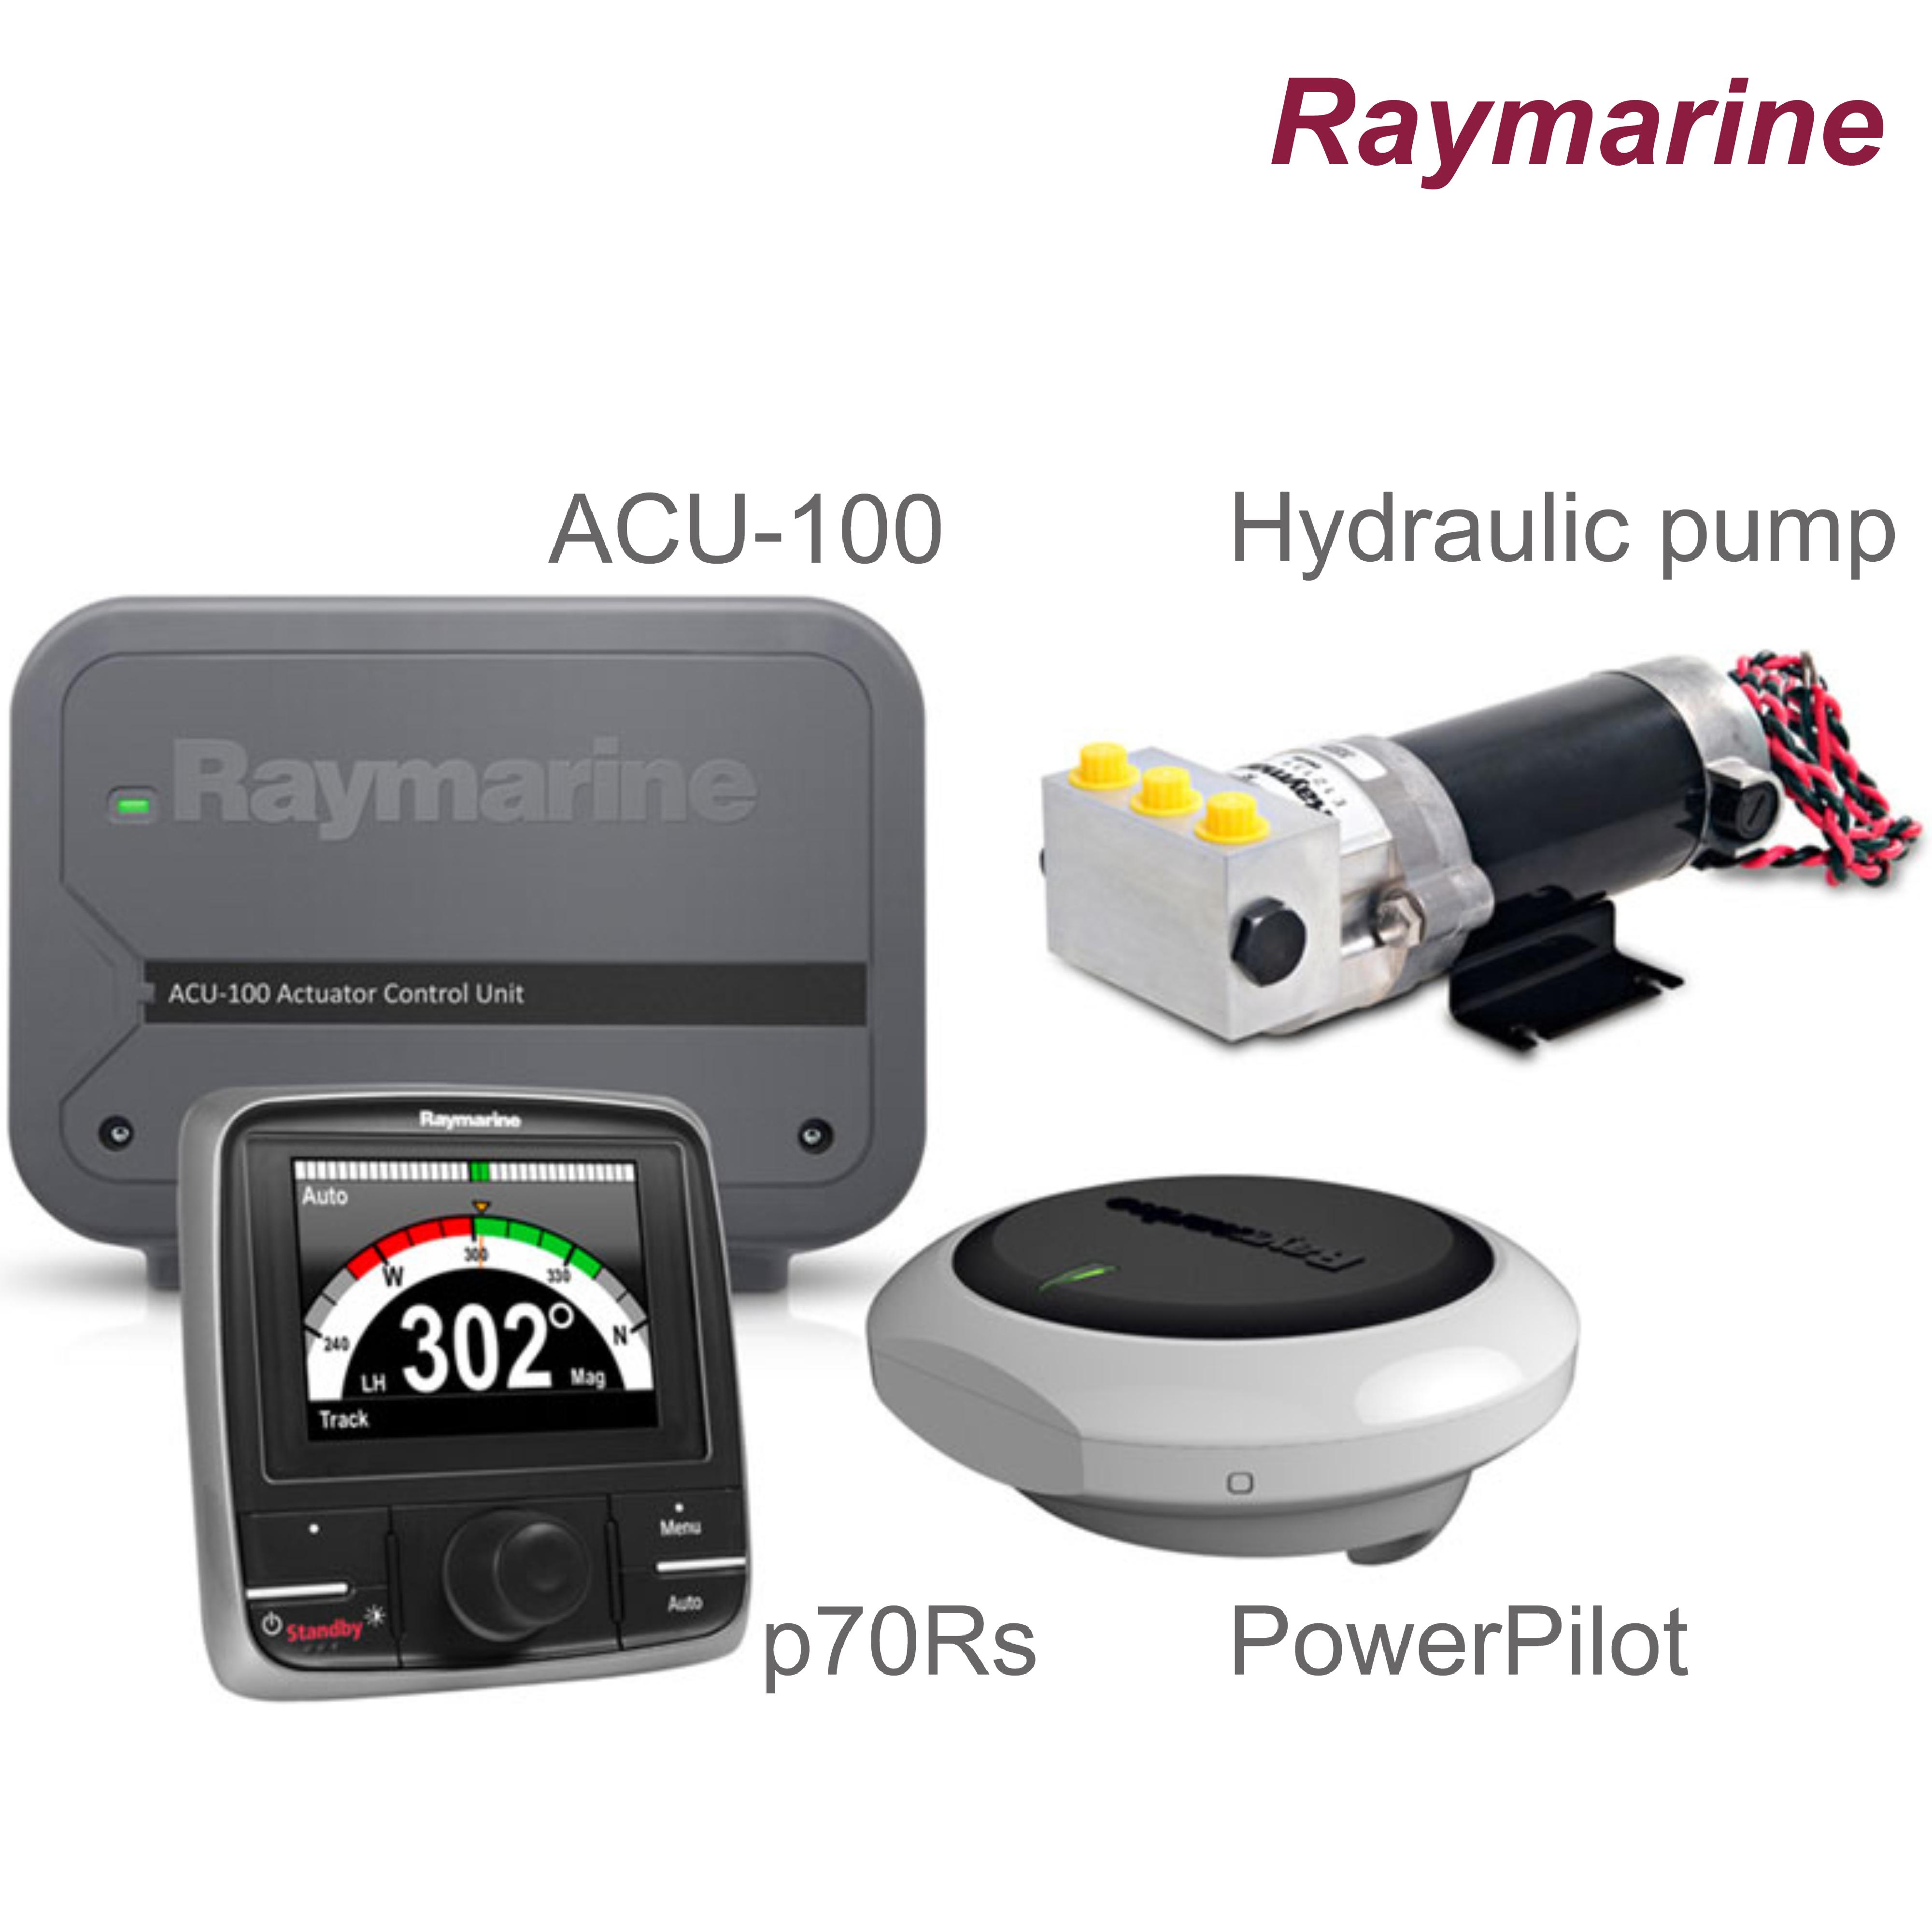 Raymarine-T70154|Evolution PowerPilot|Control Head|0.5l Hydraulic Pump|In Marine